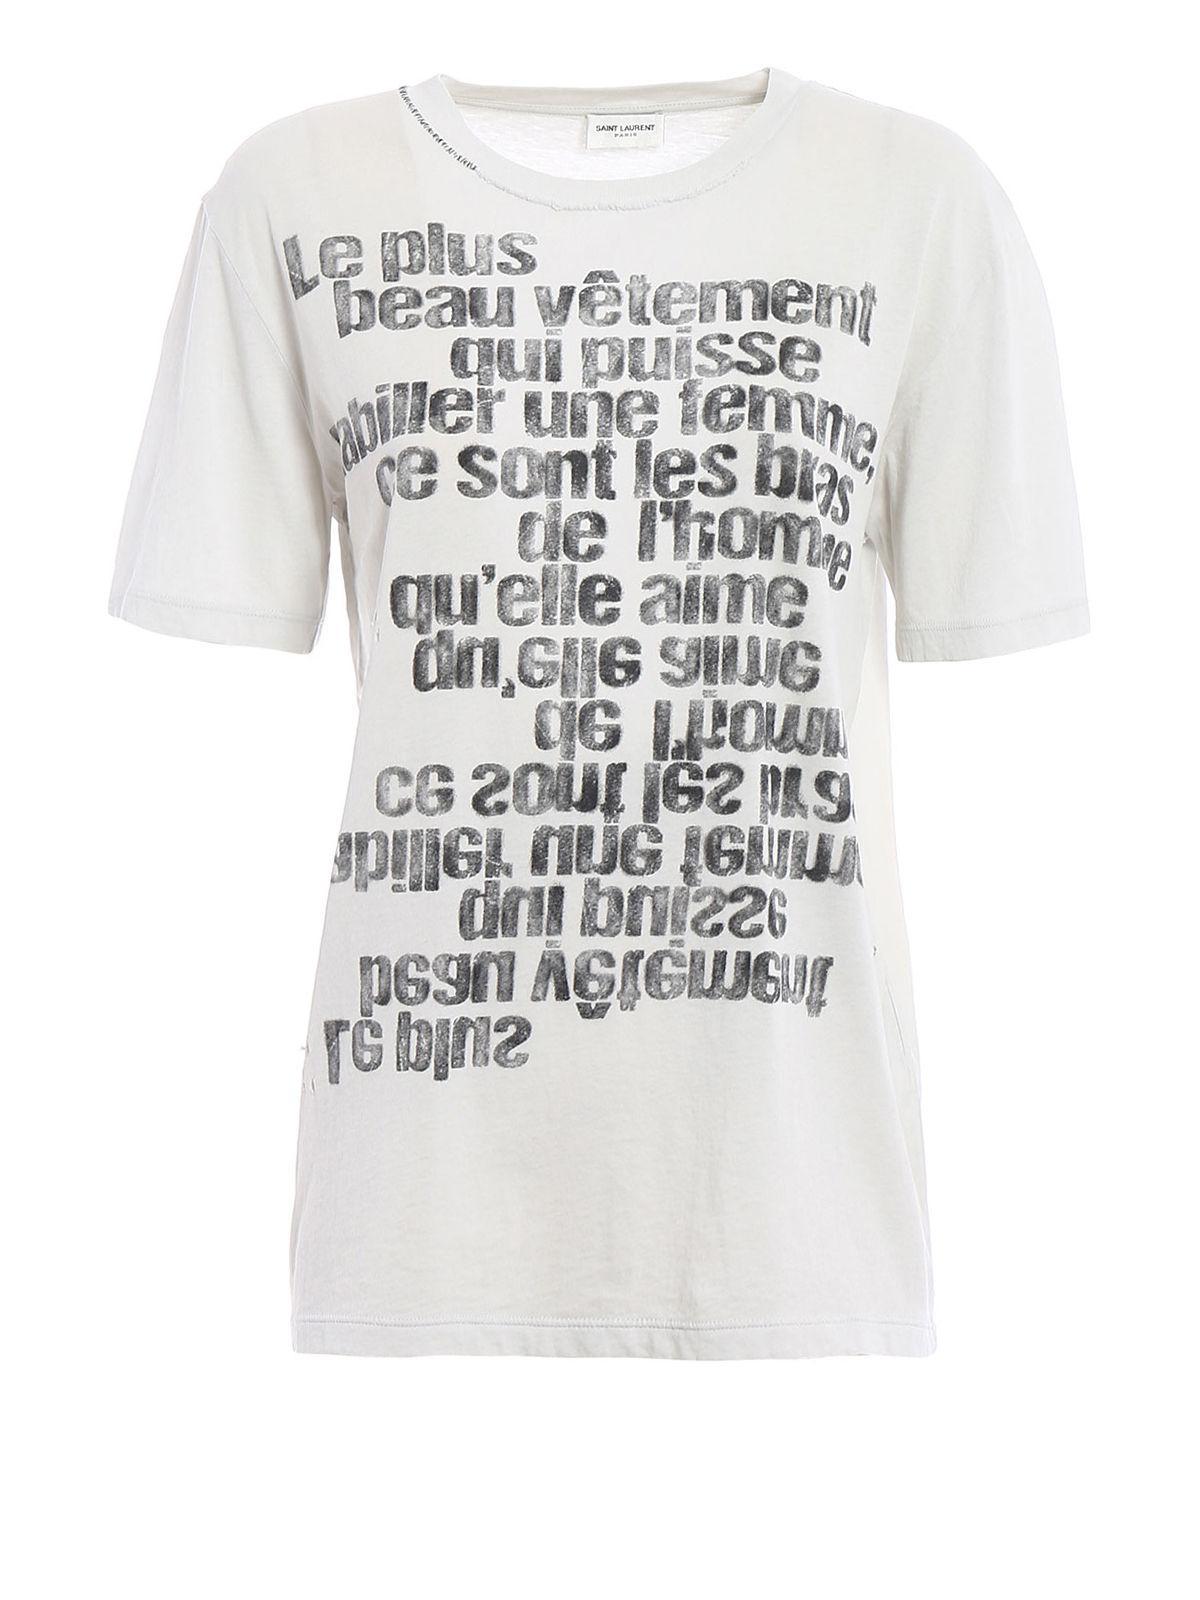 Lyst saint laurent t shirt quote printed in white for Saint laurent t shirt